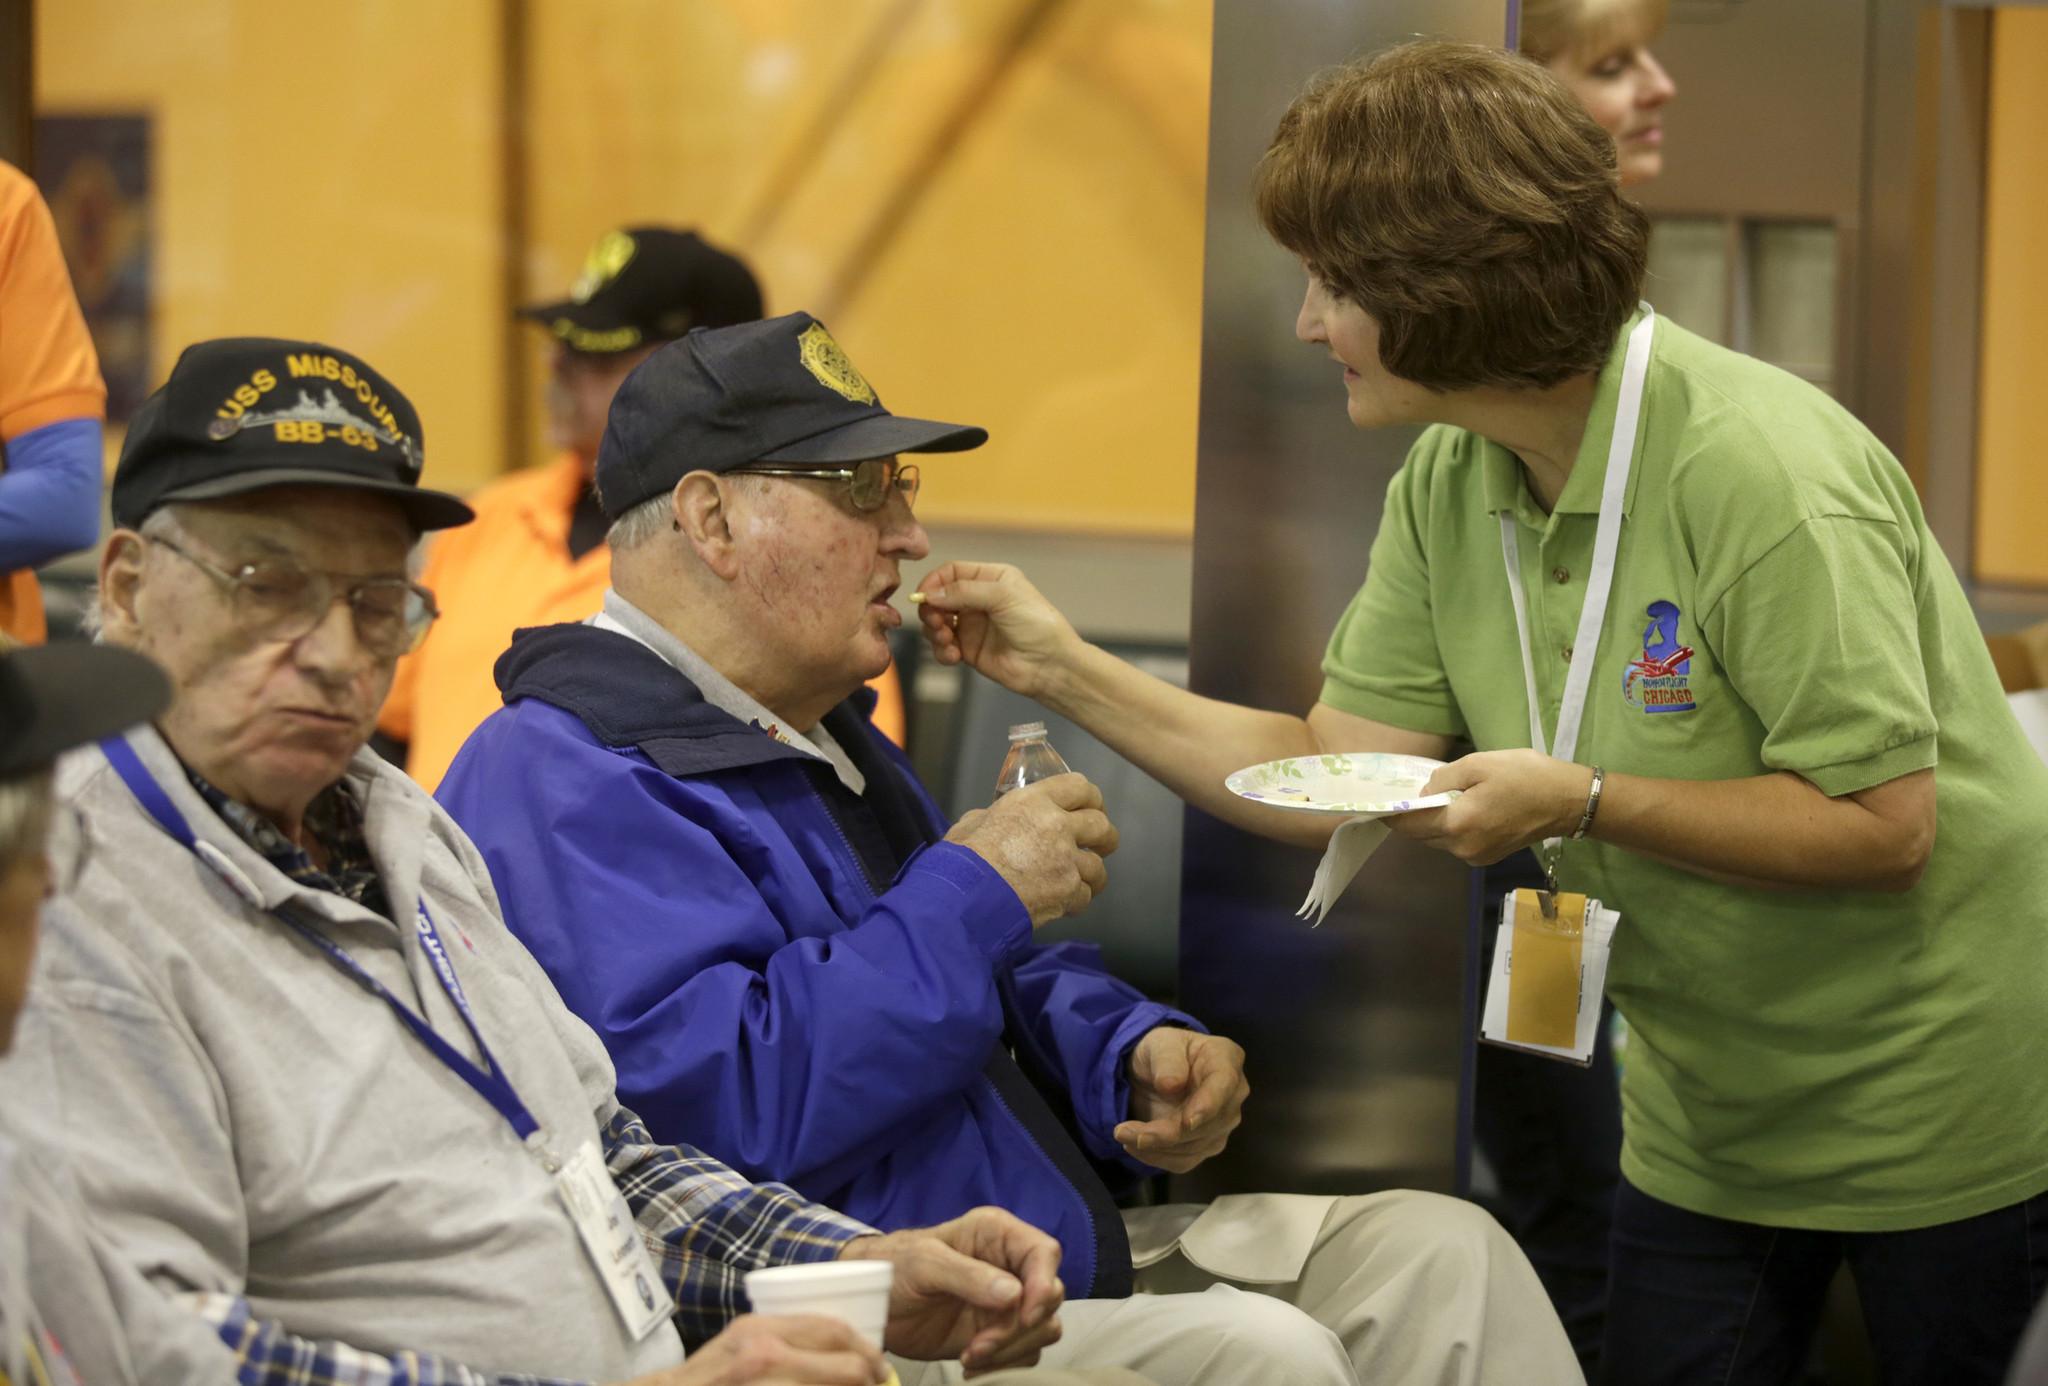 Honor flight volunteers make every day Veterans Day